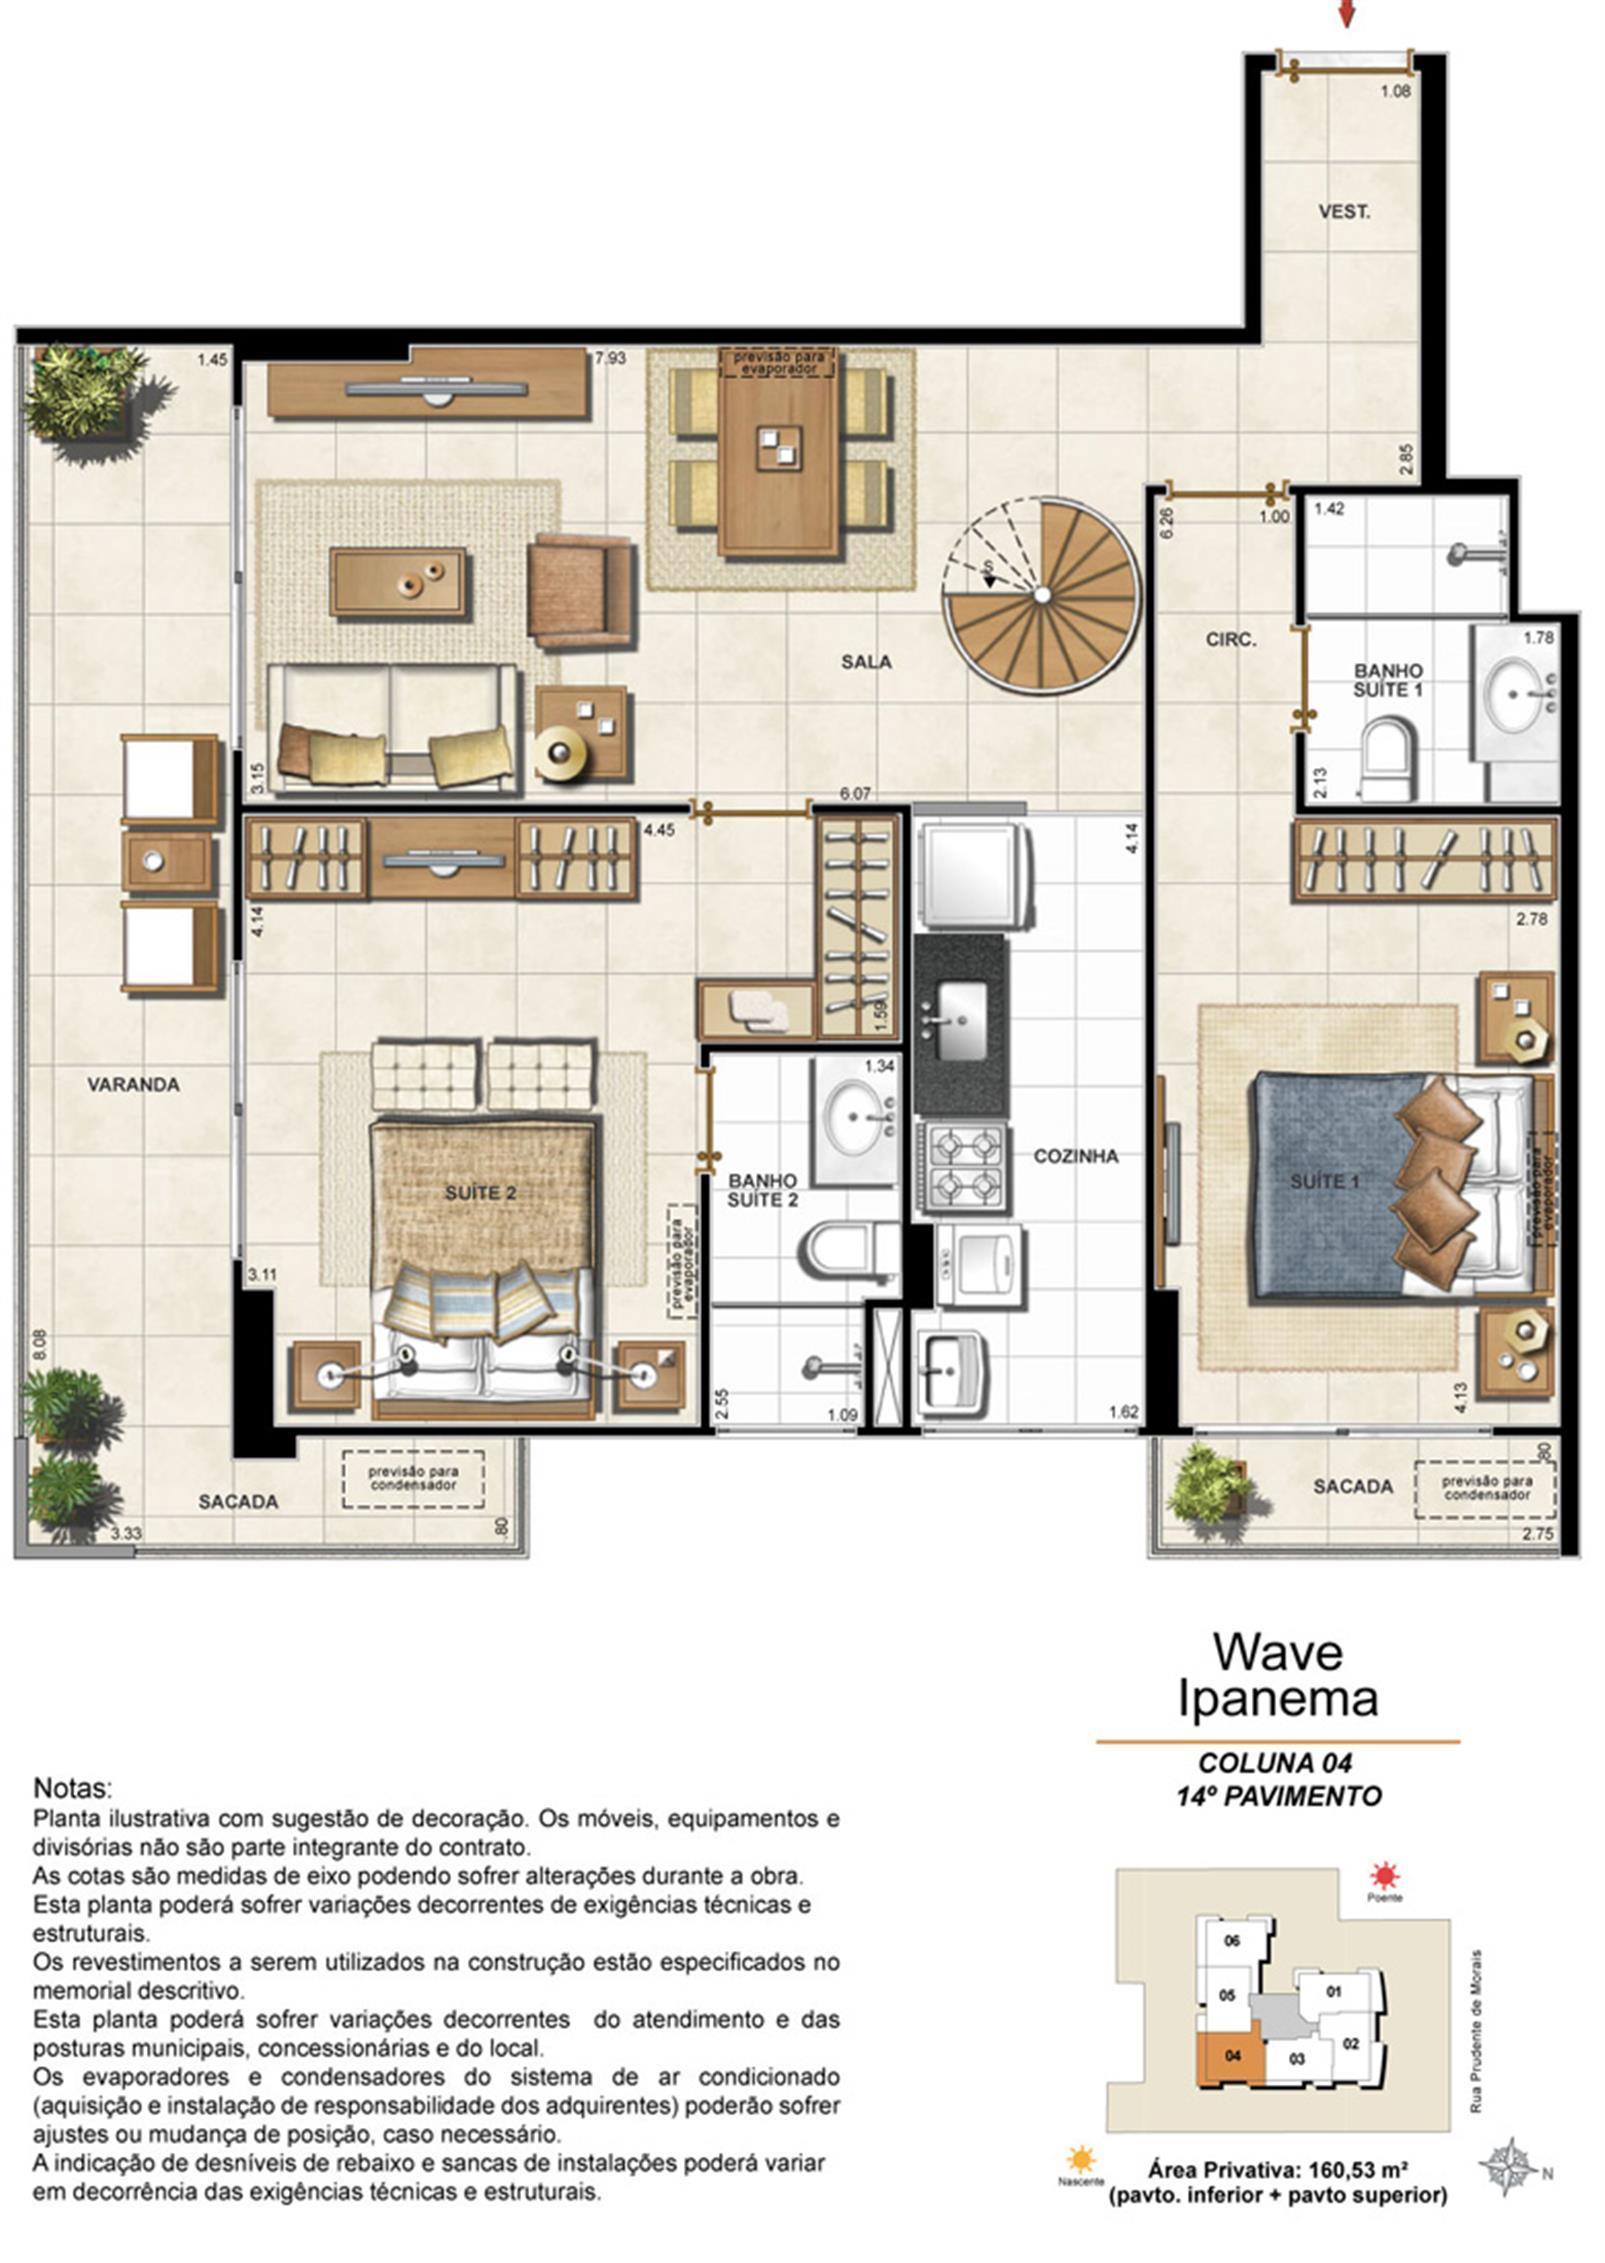 Apartamento Cobertura 1404 | Wave Ipanema – Apartamentoem  Ipanema - Rio de Janeiro - Rio de Janeiro